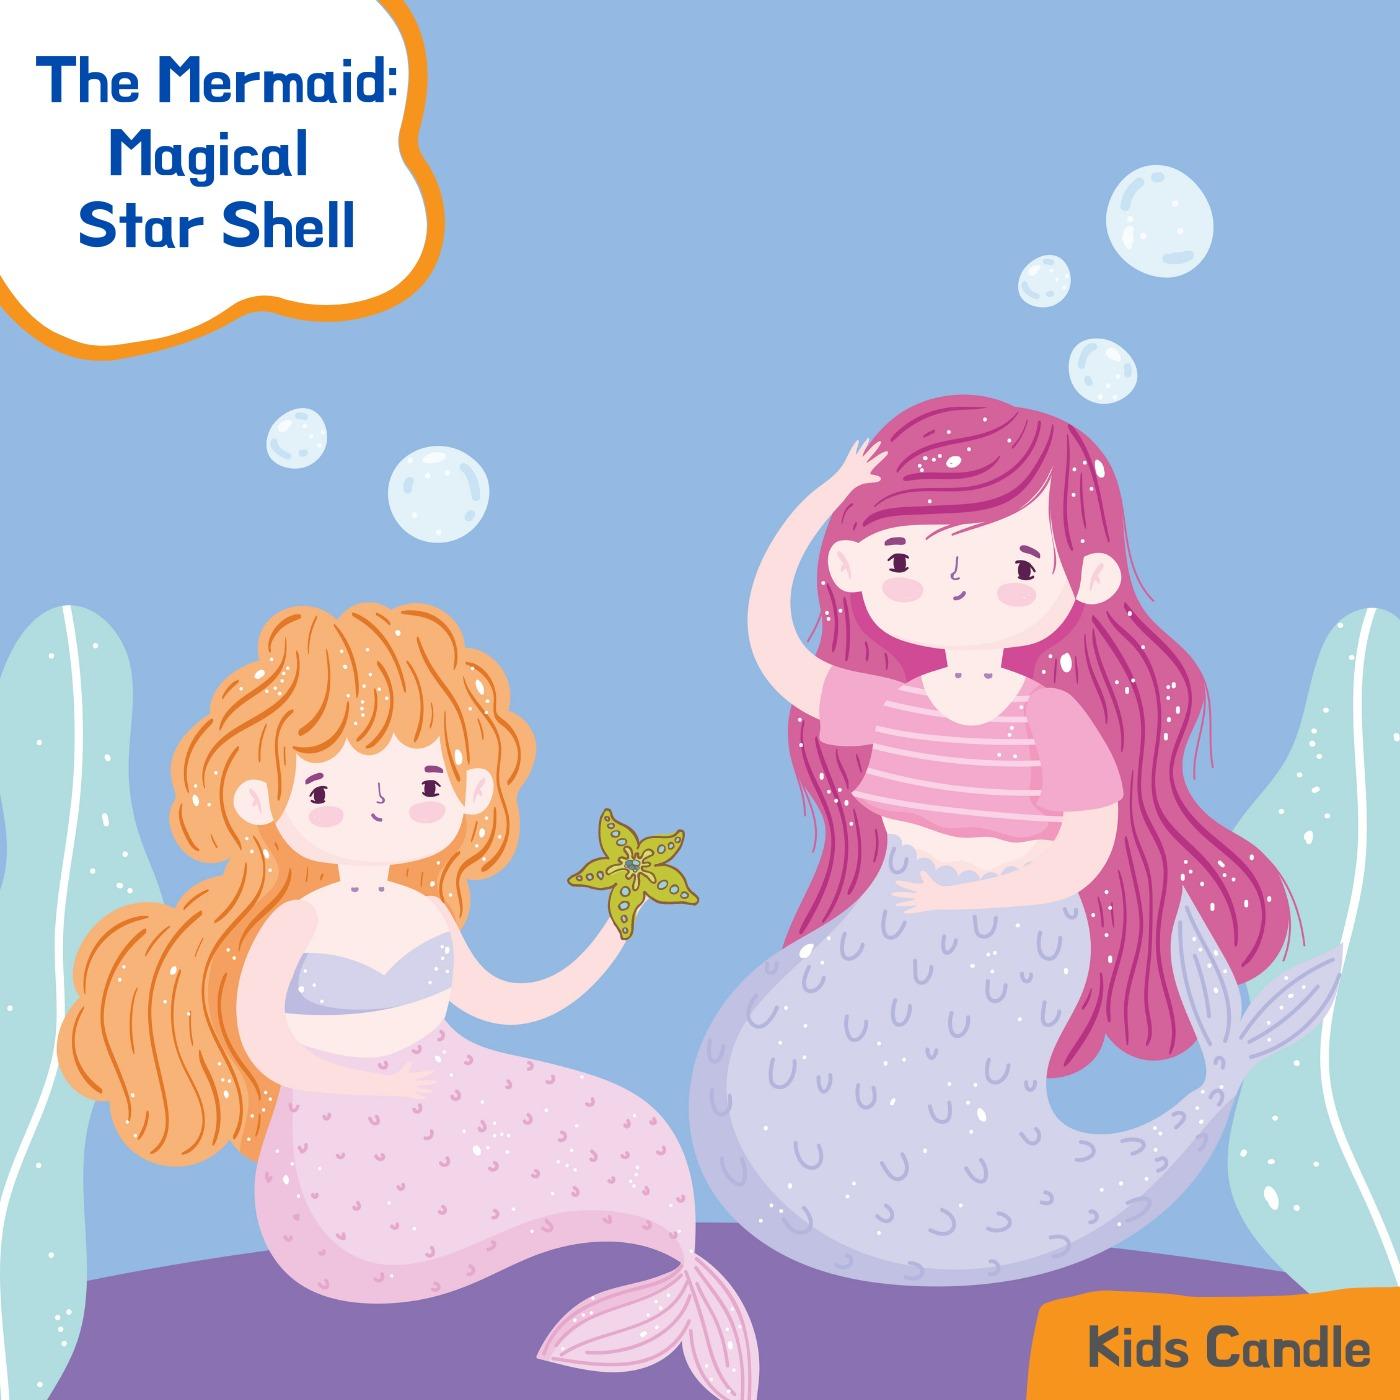 The Little Mermaid: Magical Star Shell